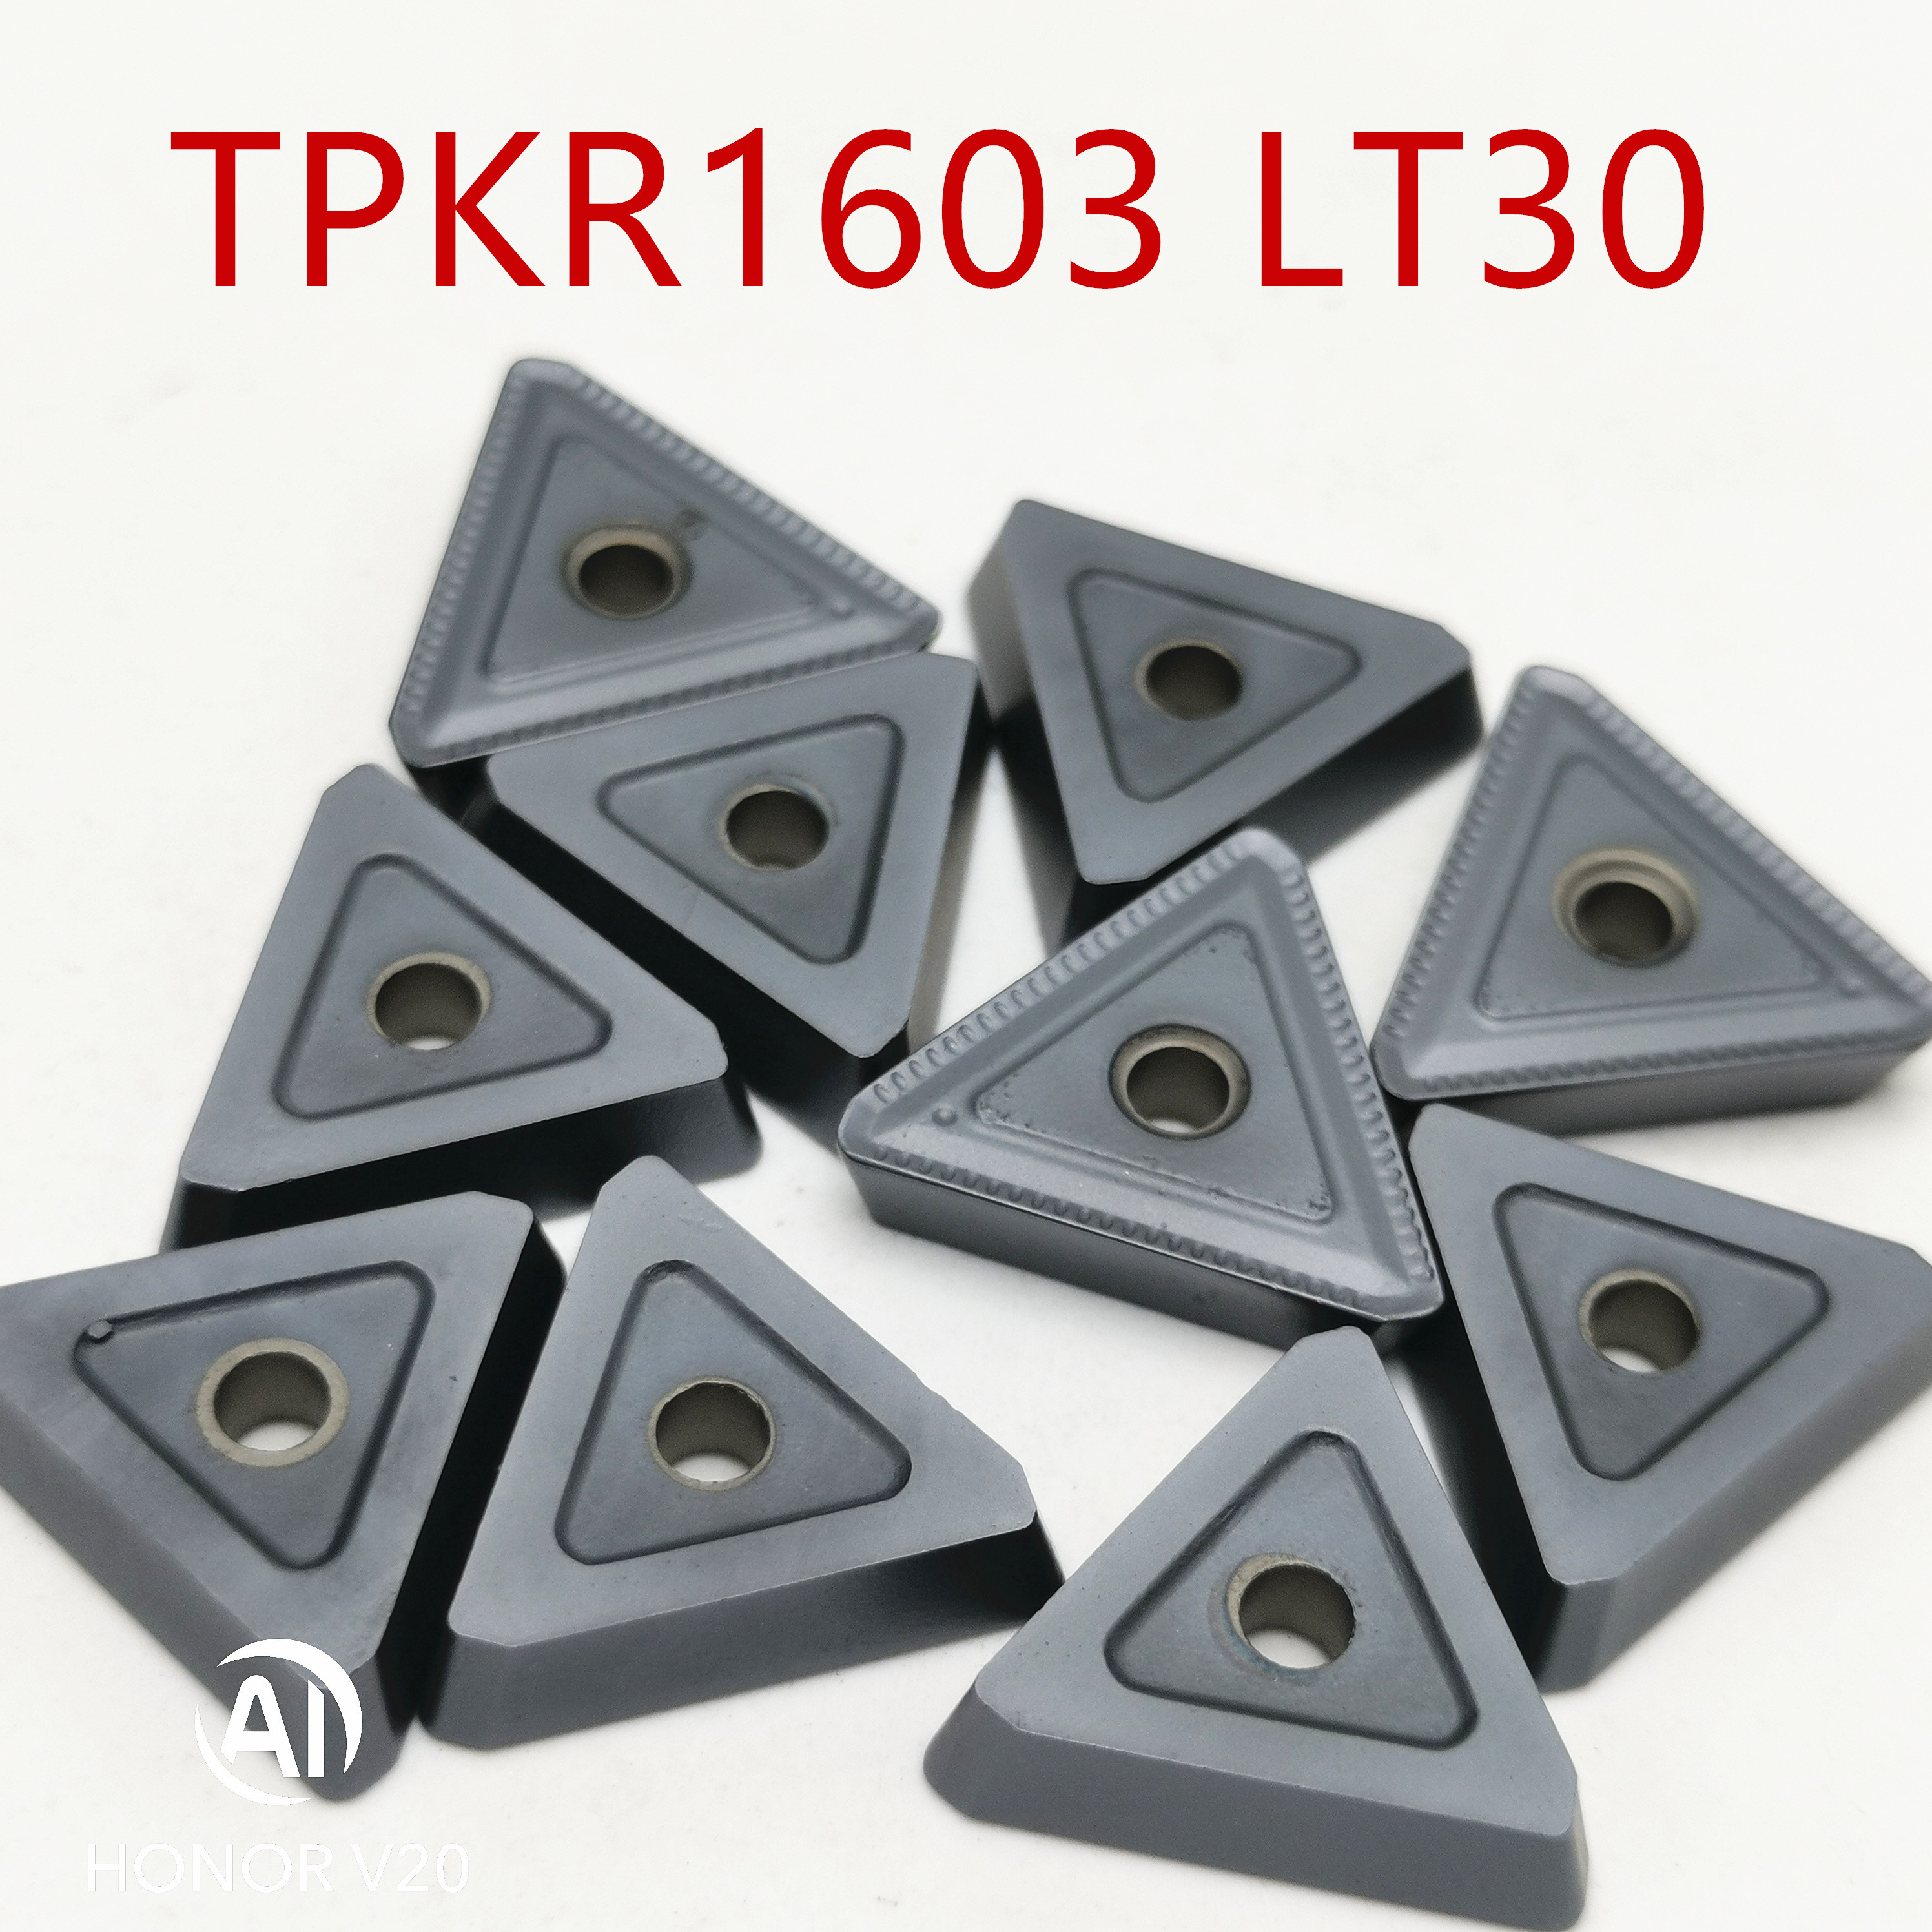 TPKN1603 PDTR LT30 Milling Turning Tools Carbide inserts Lathe cutter TPKR1603 pdtr Mill Cutting Turning Tool CNC Tools in Turning Tool from Tools